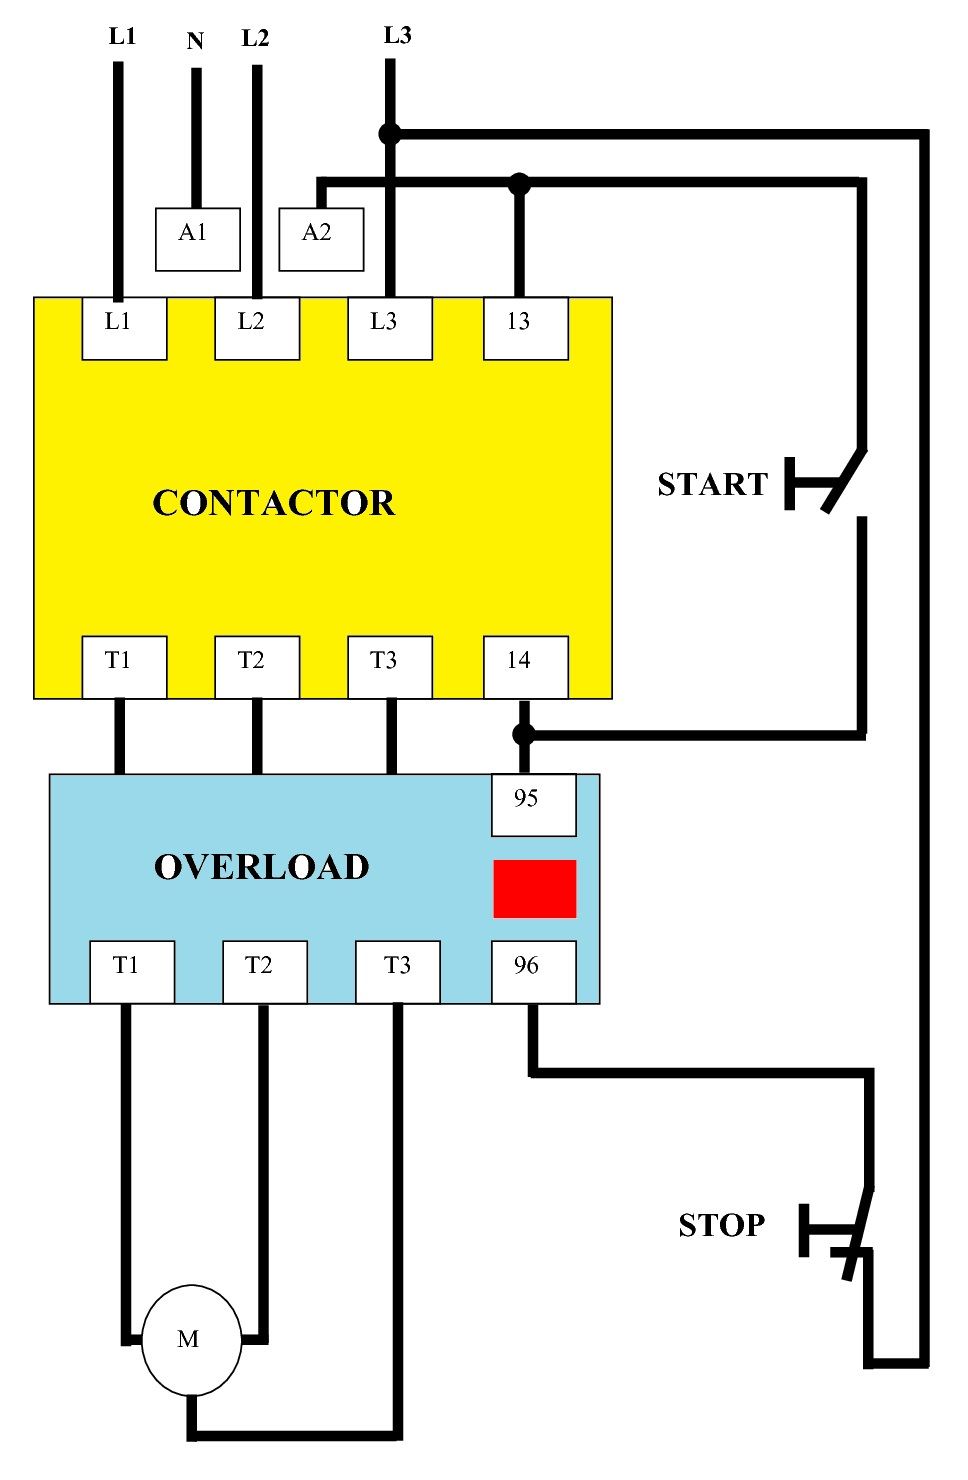 elec wiring diagram elec wiring diagrams direct on line wiring diagram